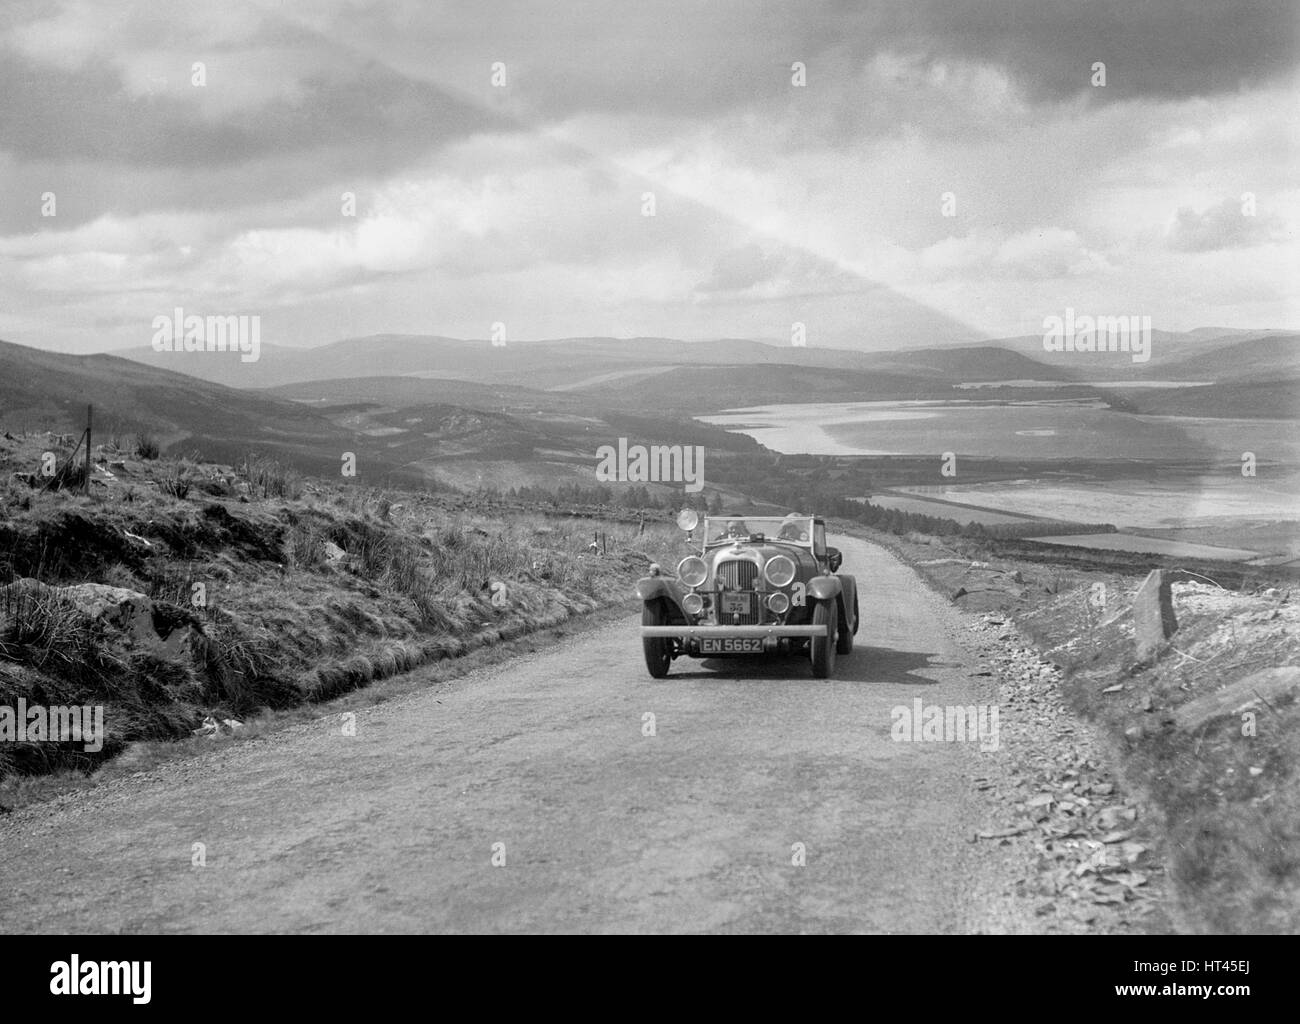 Lagonda open tourer of CG Seddon competing in the RSAC Scottish Rally, 1934. Artist: Bill Brunell. - Stock Image